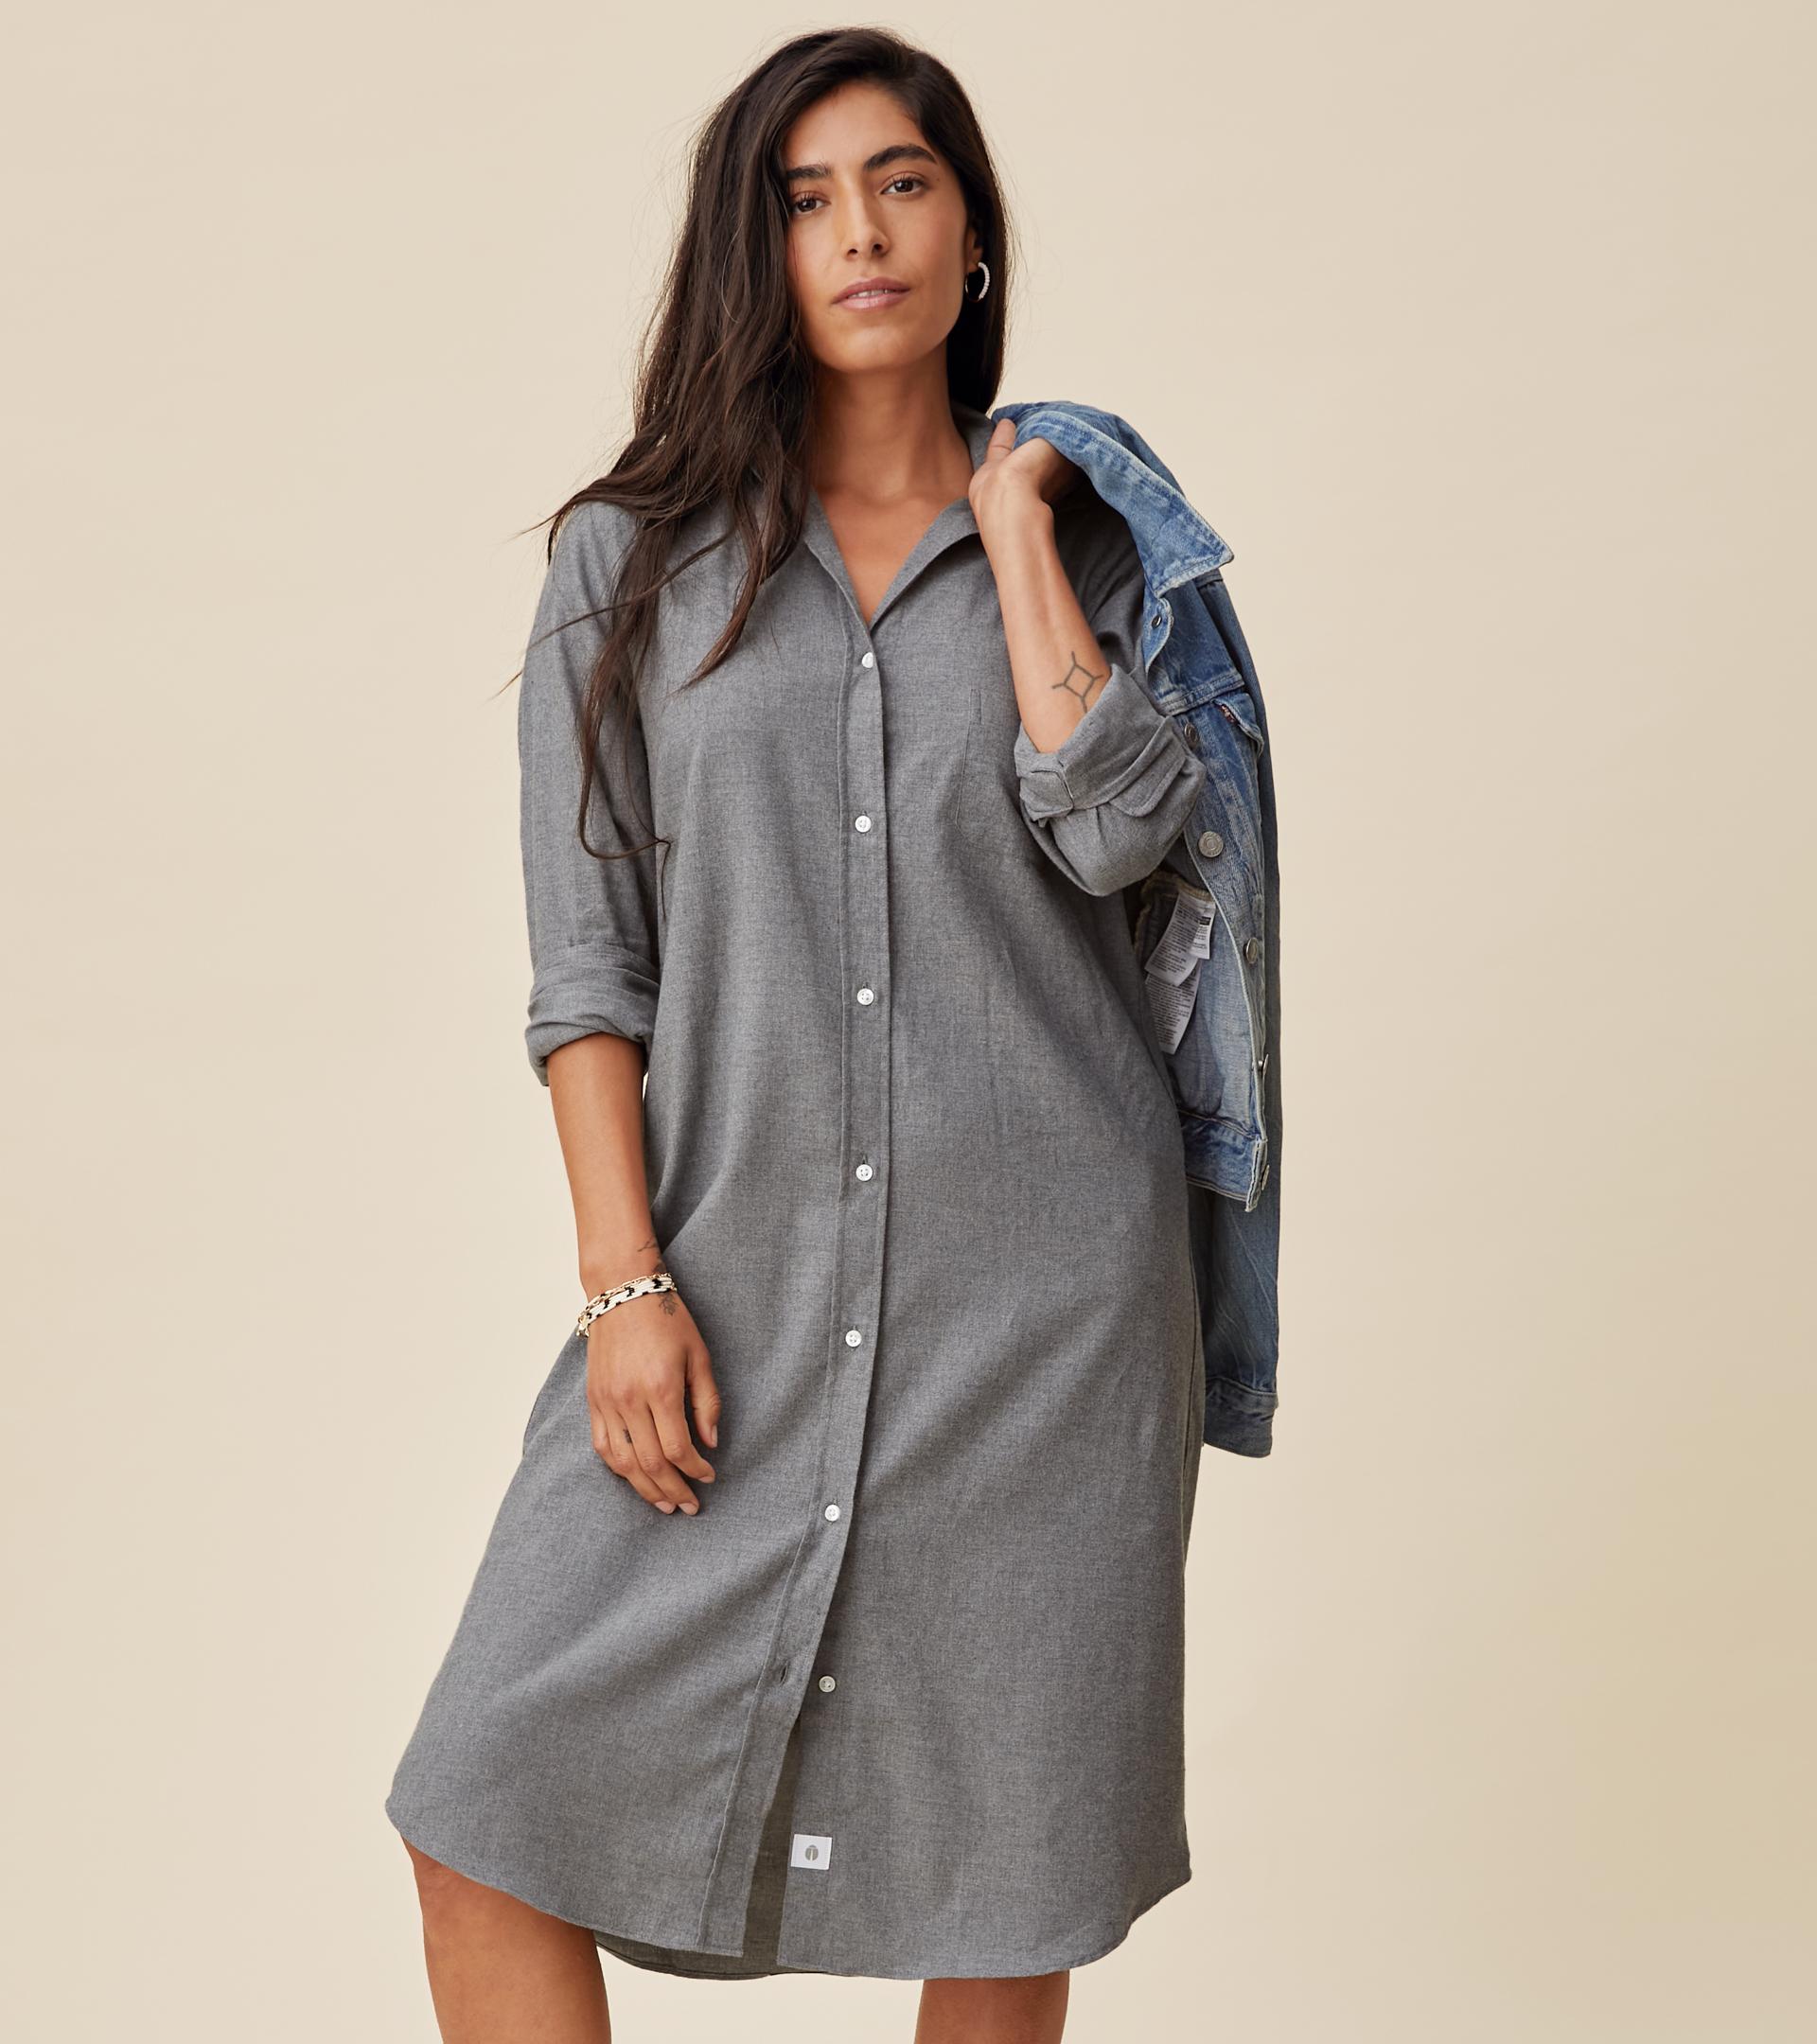 Image of The Hero Midi Dress Gray Melange, Feathered Flannel